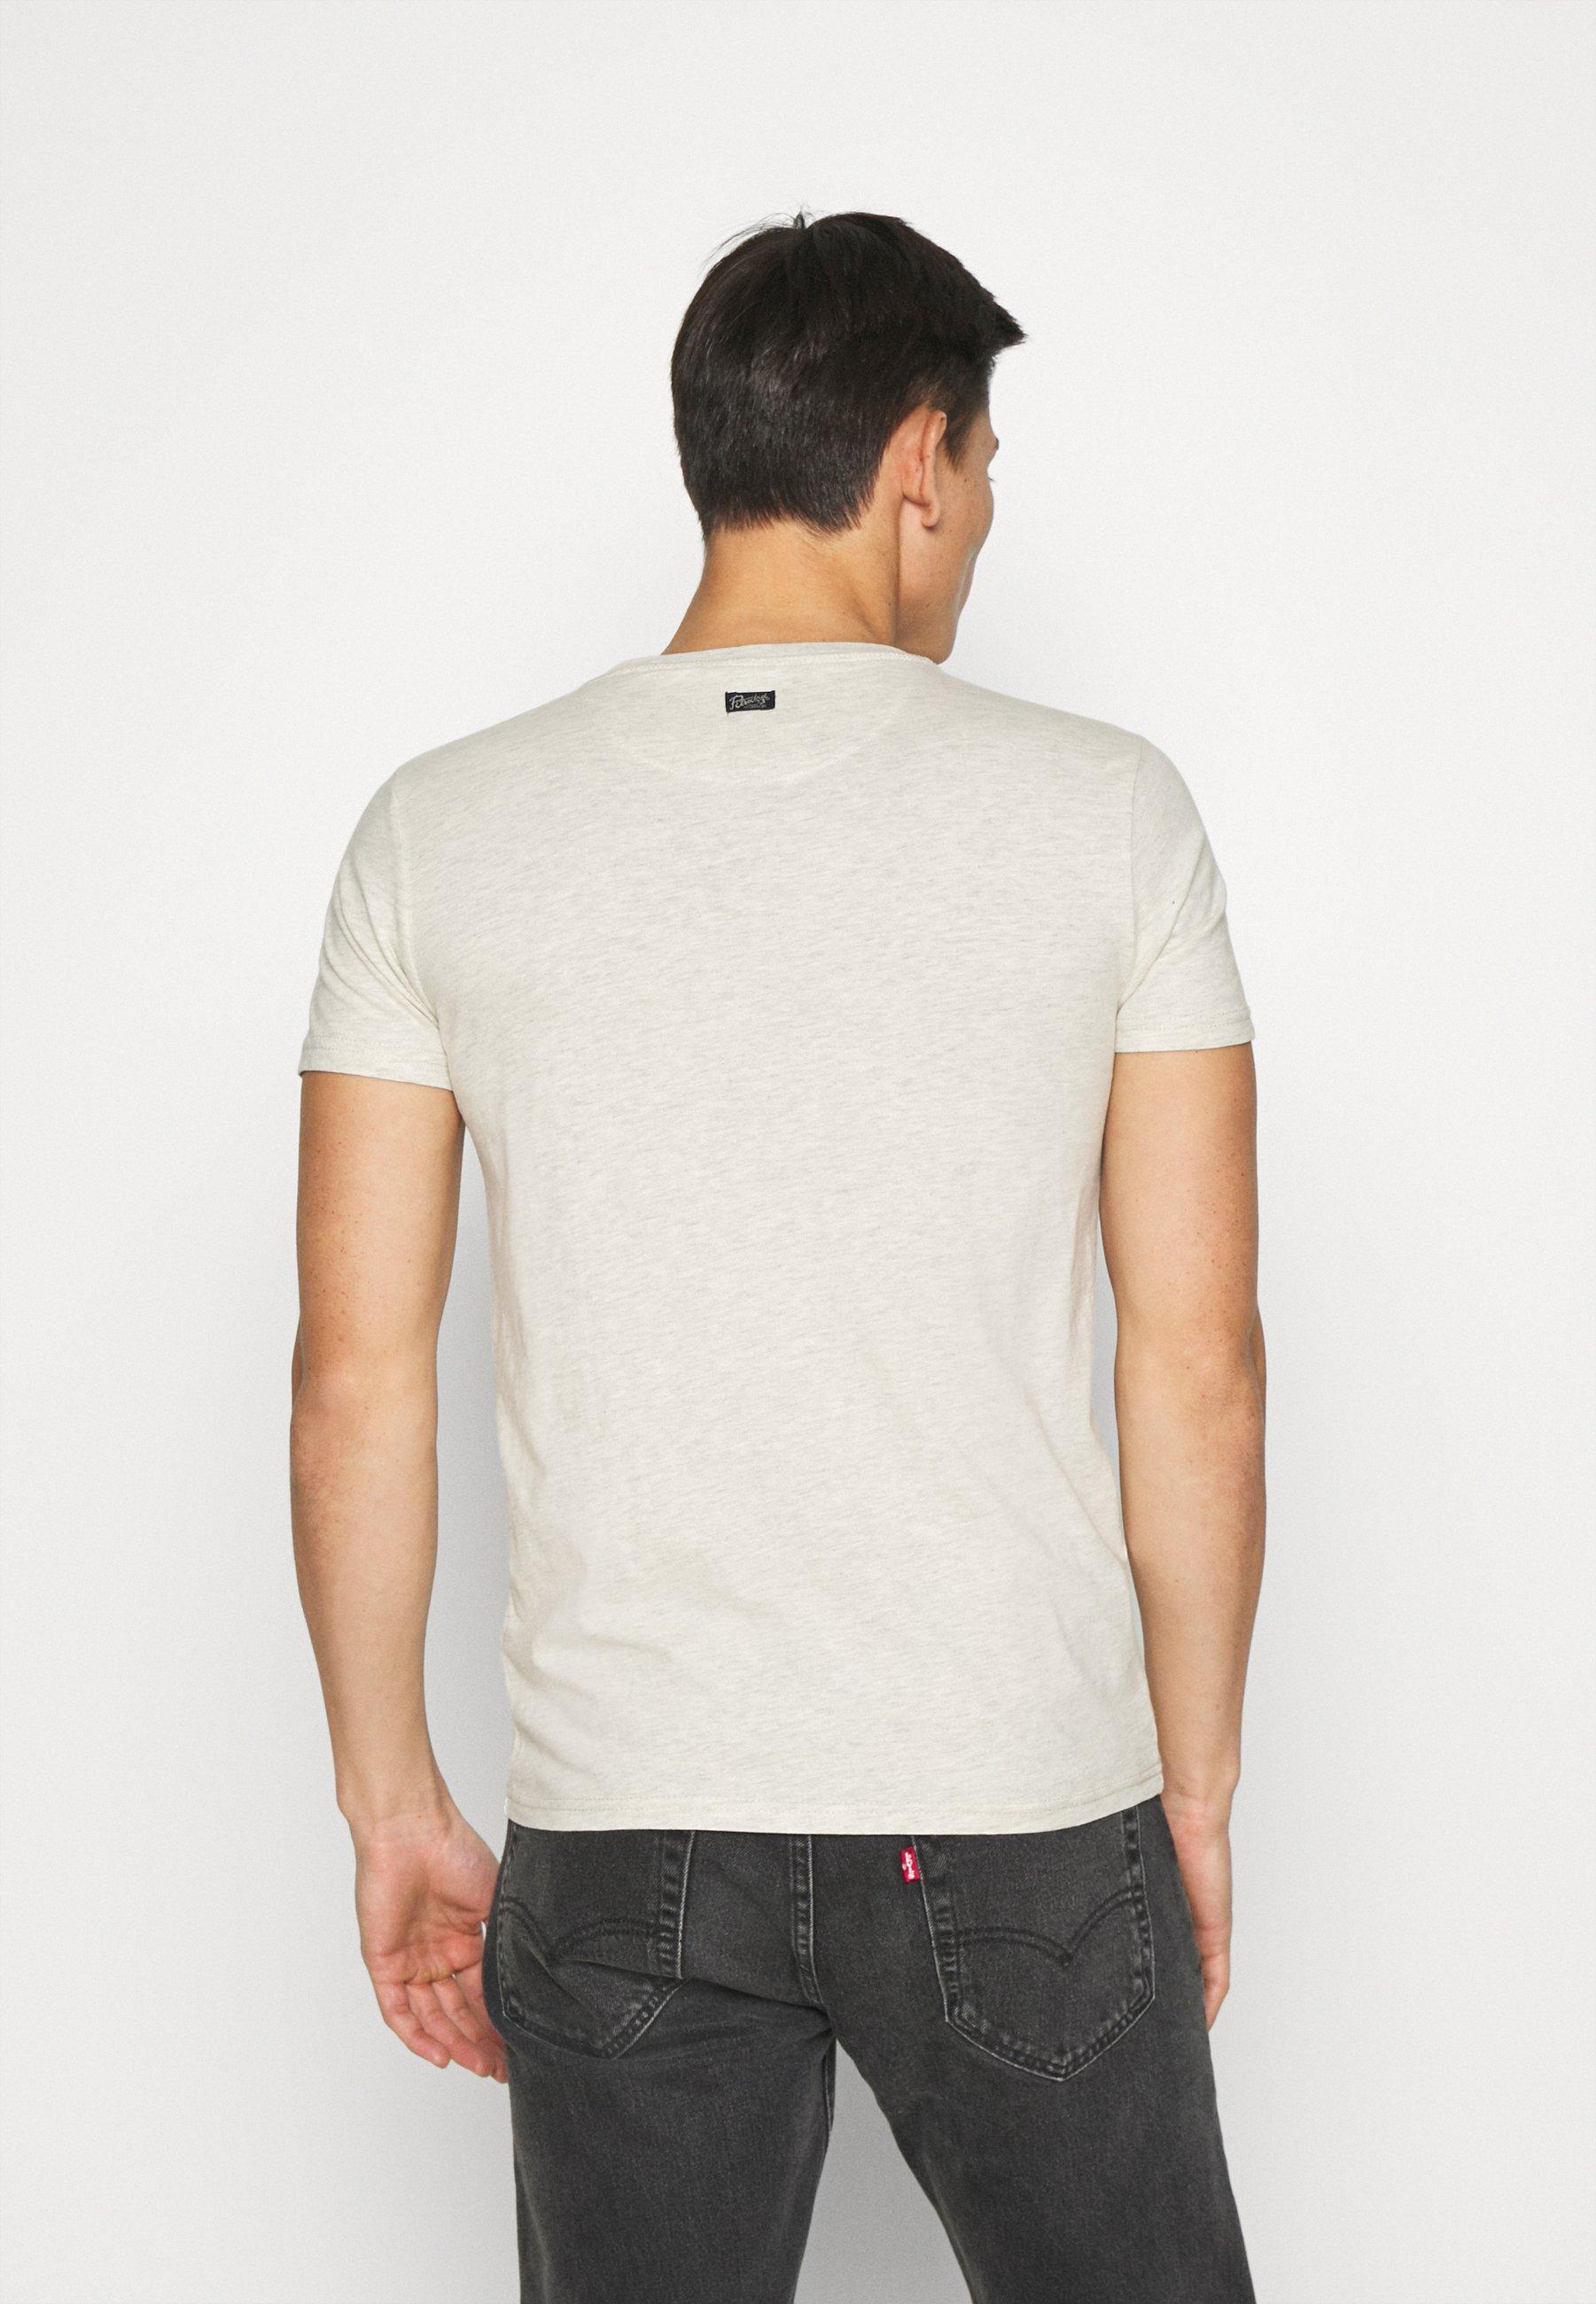 Petrol Industries Print T-shirt - antik white 50sCH